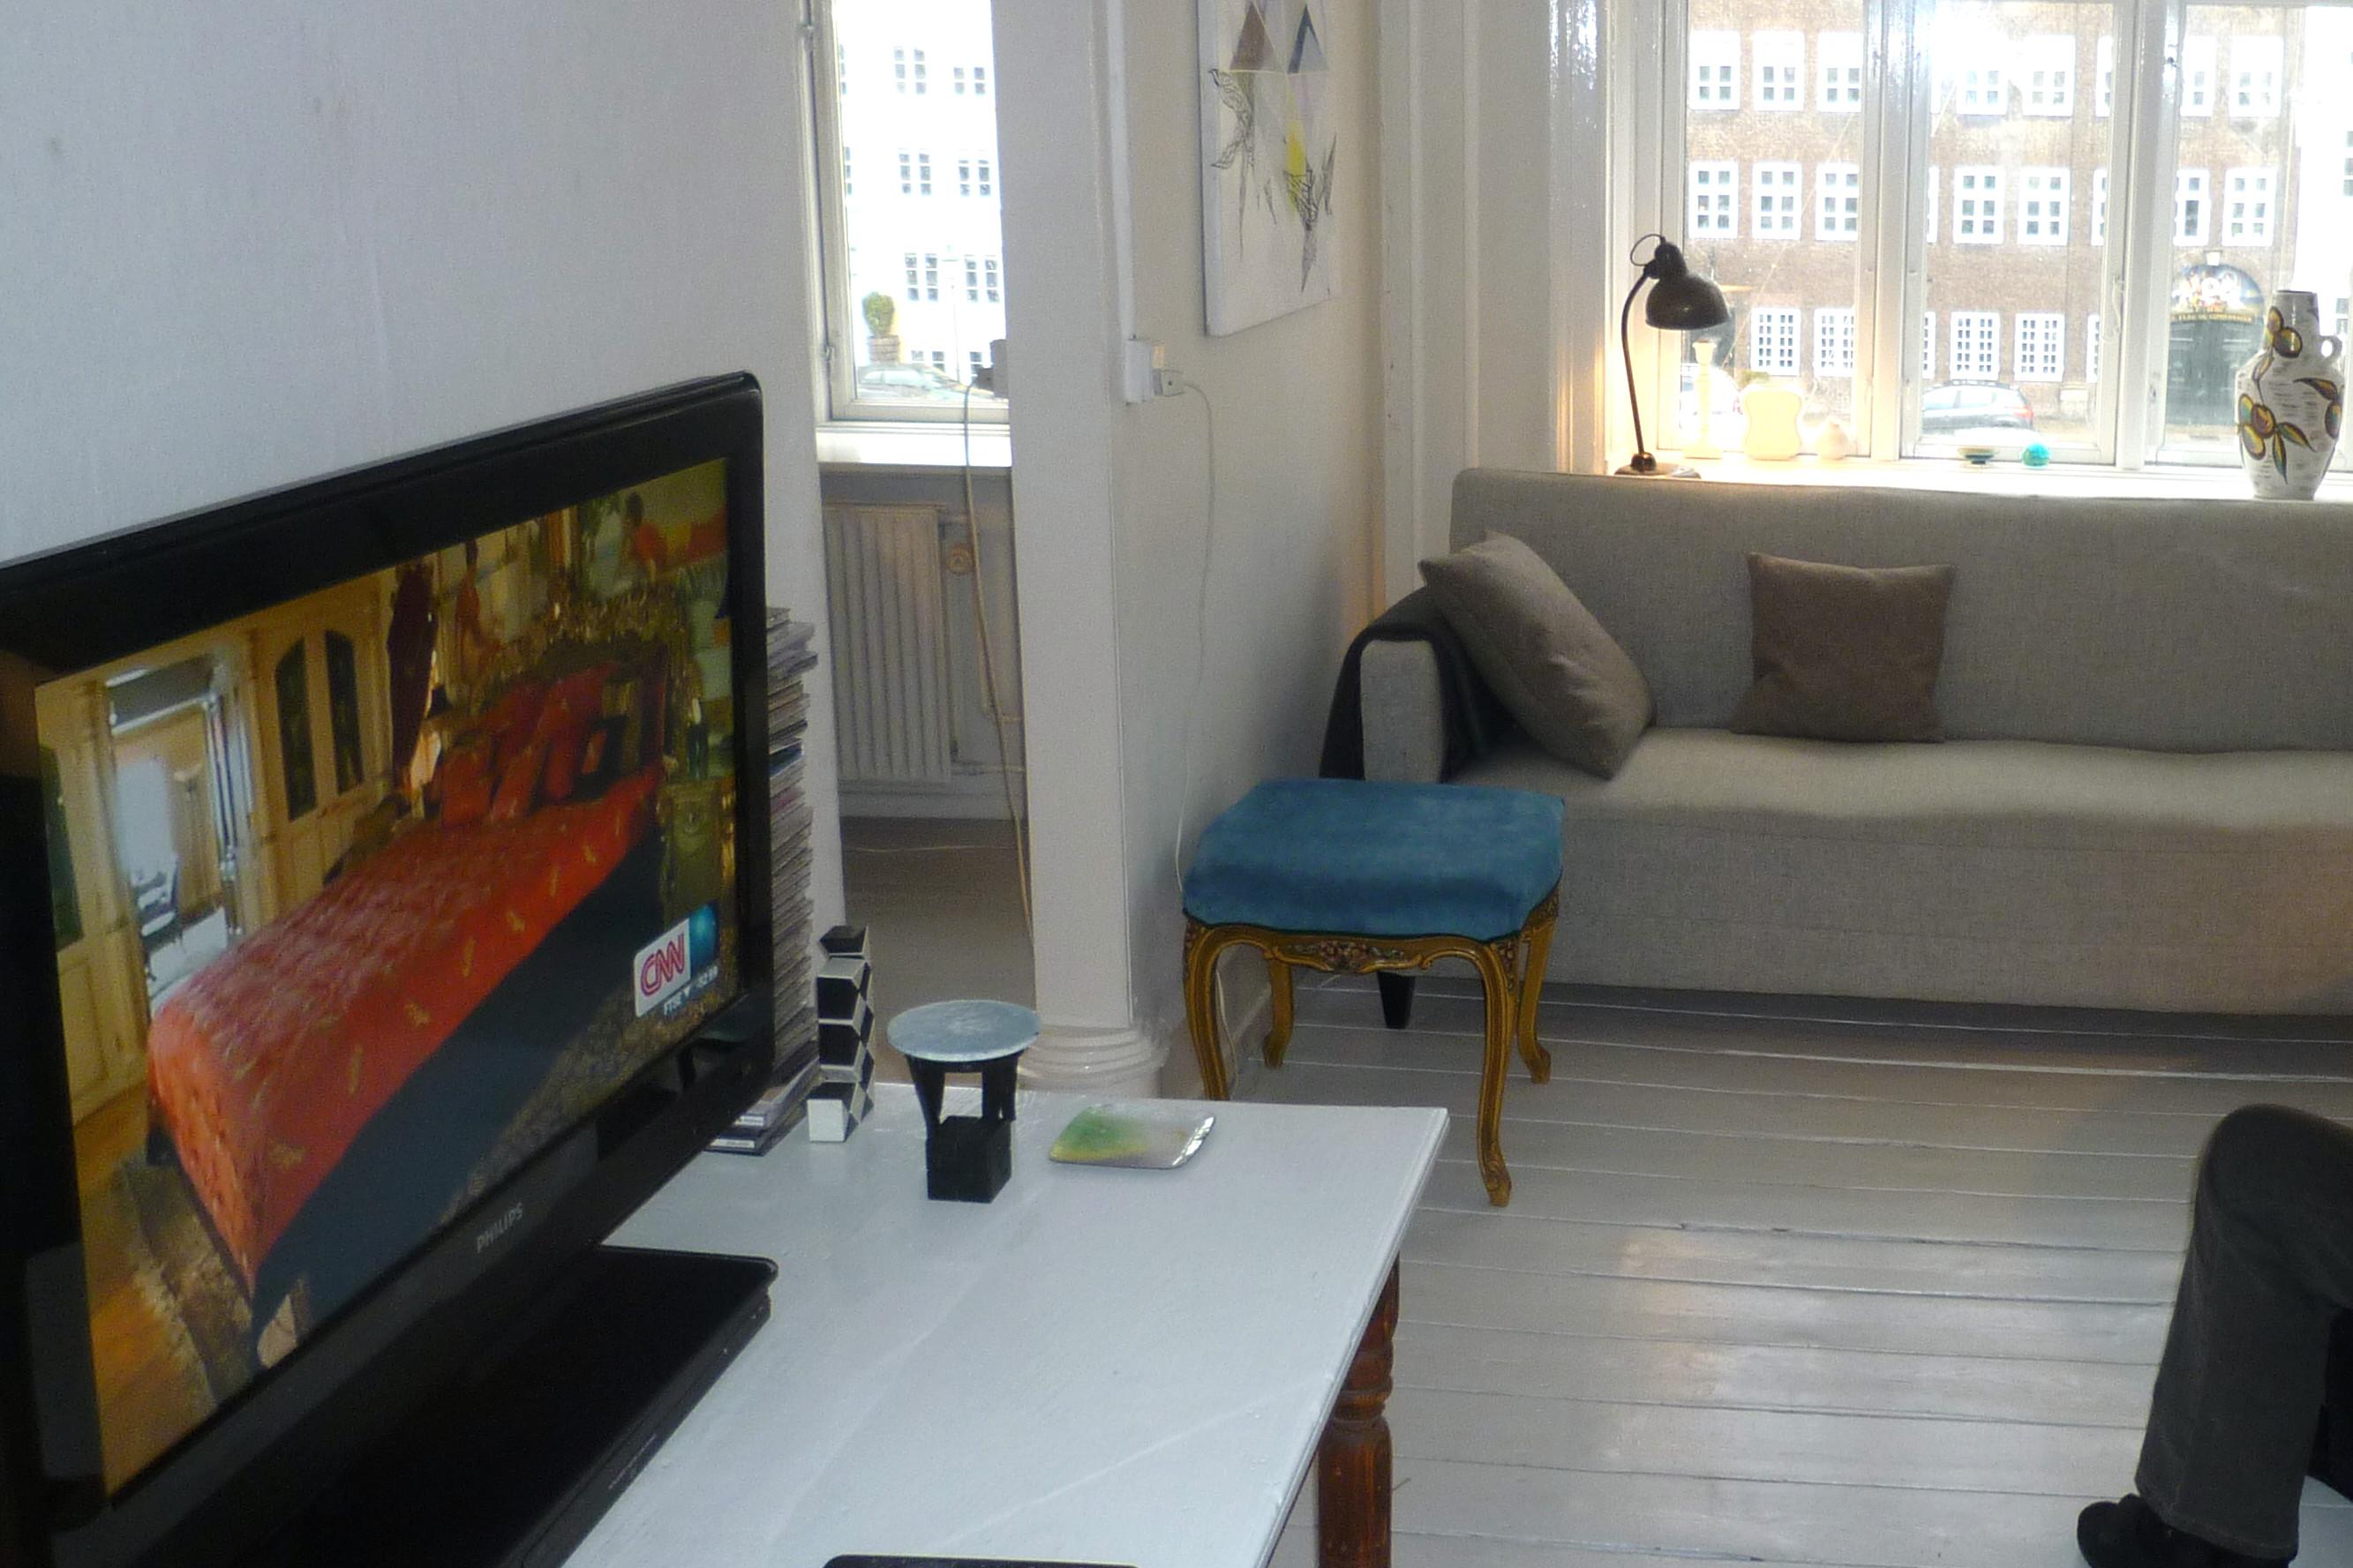 bernachtung in kopenhagen alwisgenussreisen. Black Bedroom Furniture Sets. Home Design Ideas